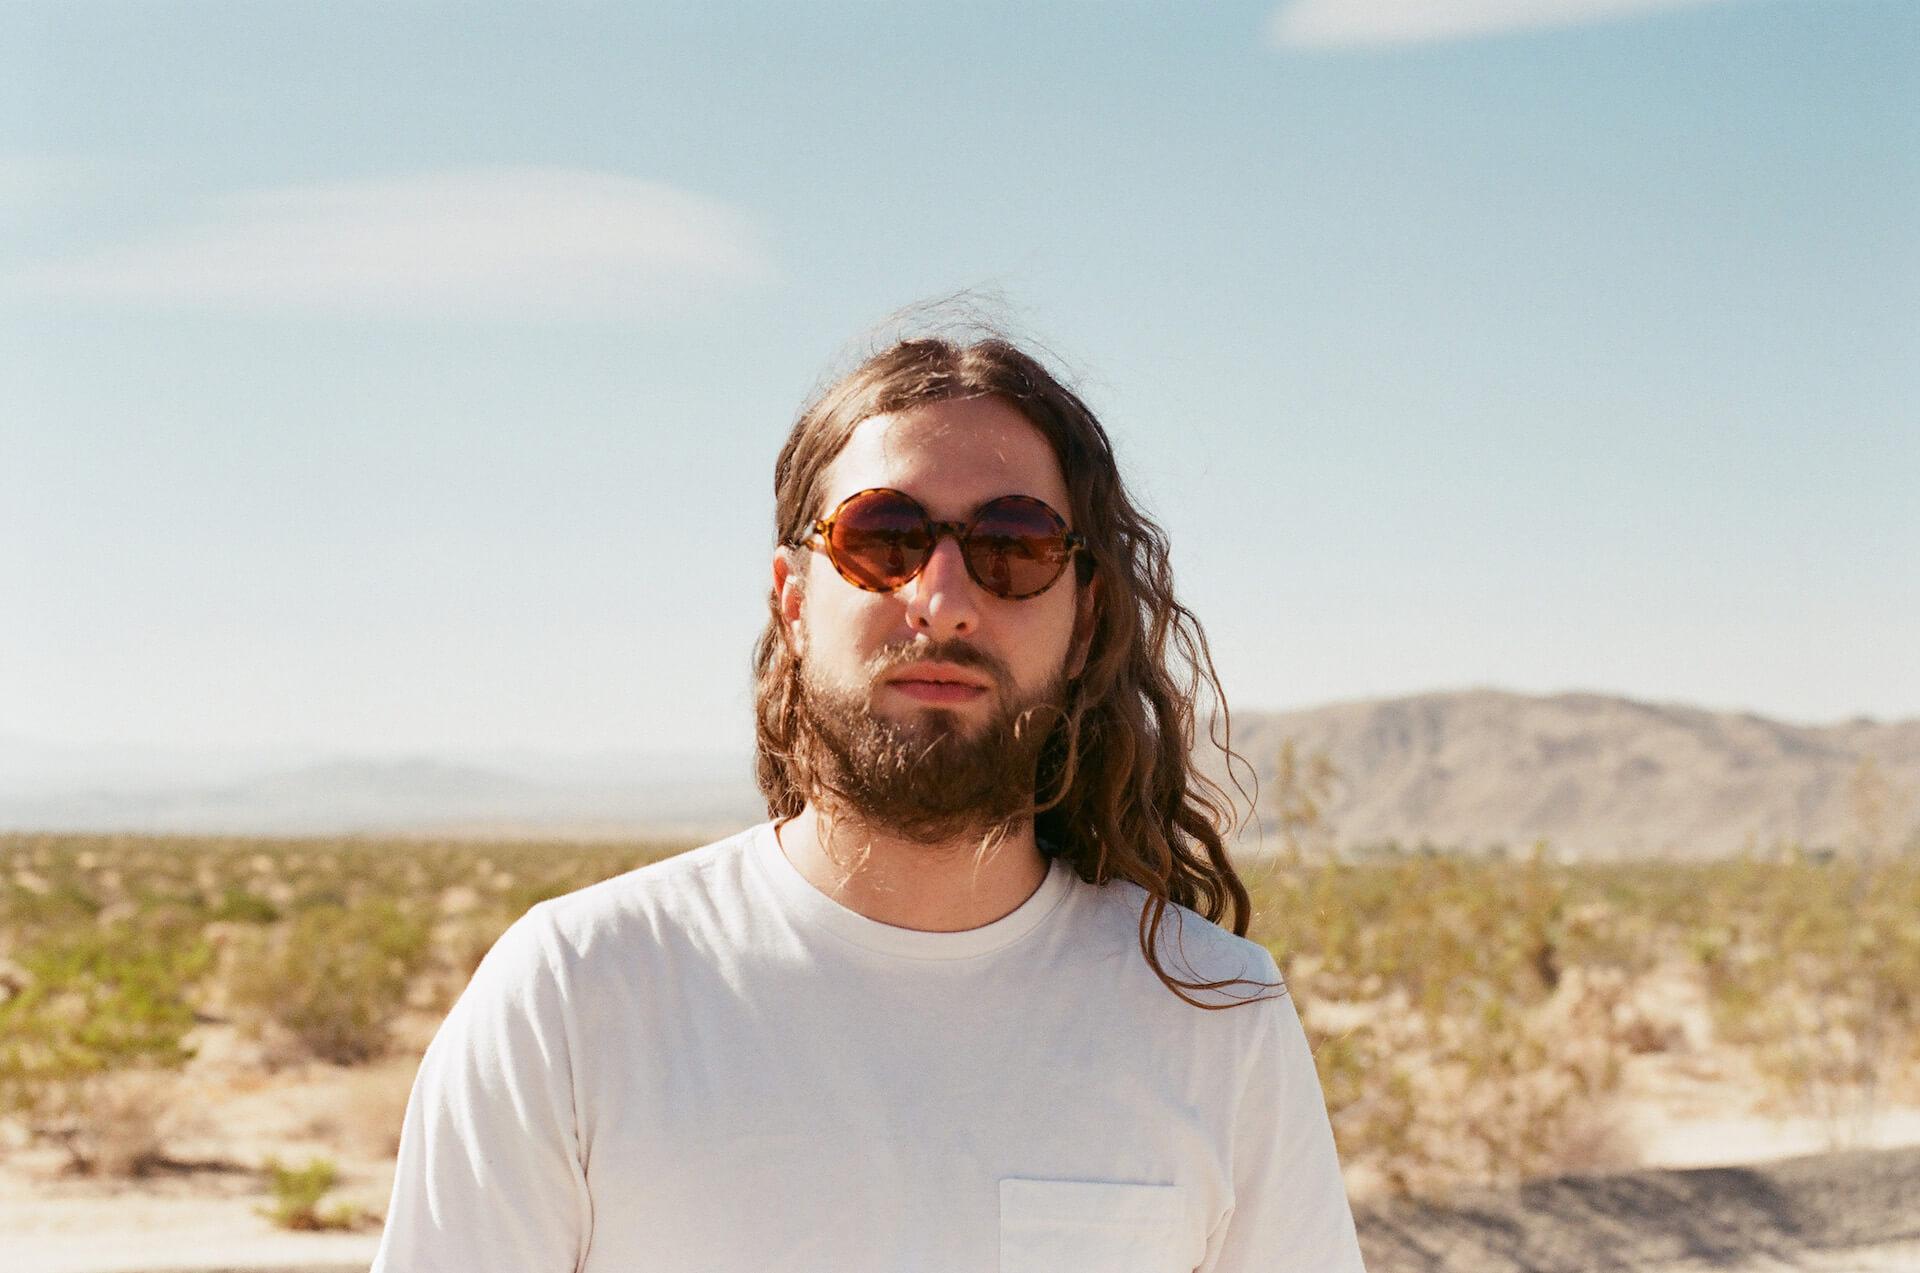 Nate Marcereau初のアルバム『Joy Techniques』が本日リリース Terrace Martinも客演参加 music200925_natemarcereau_2